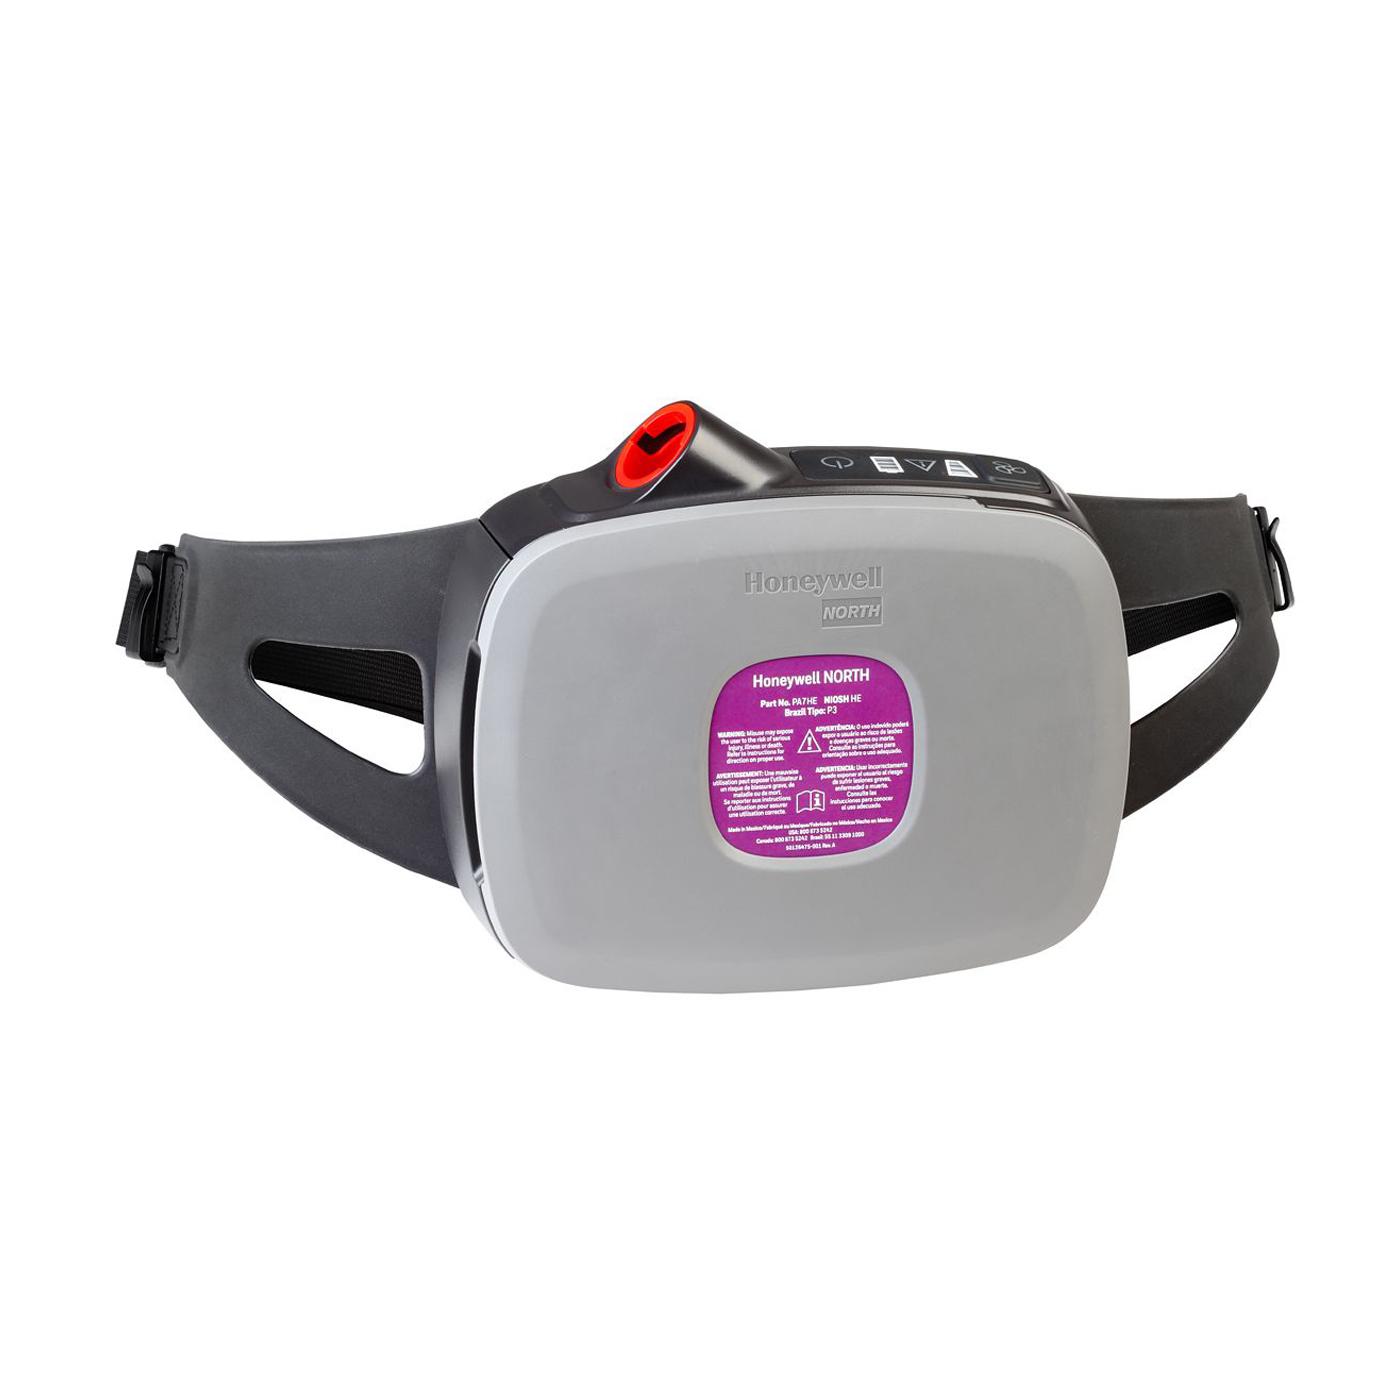 Respirator pneumatyczny Primair PA 700 Honeywell North